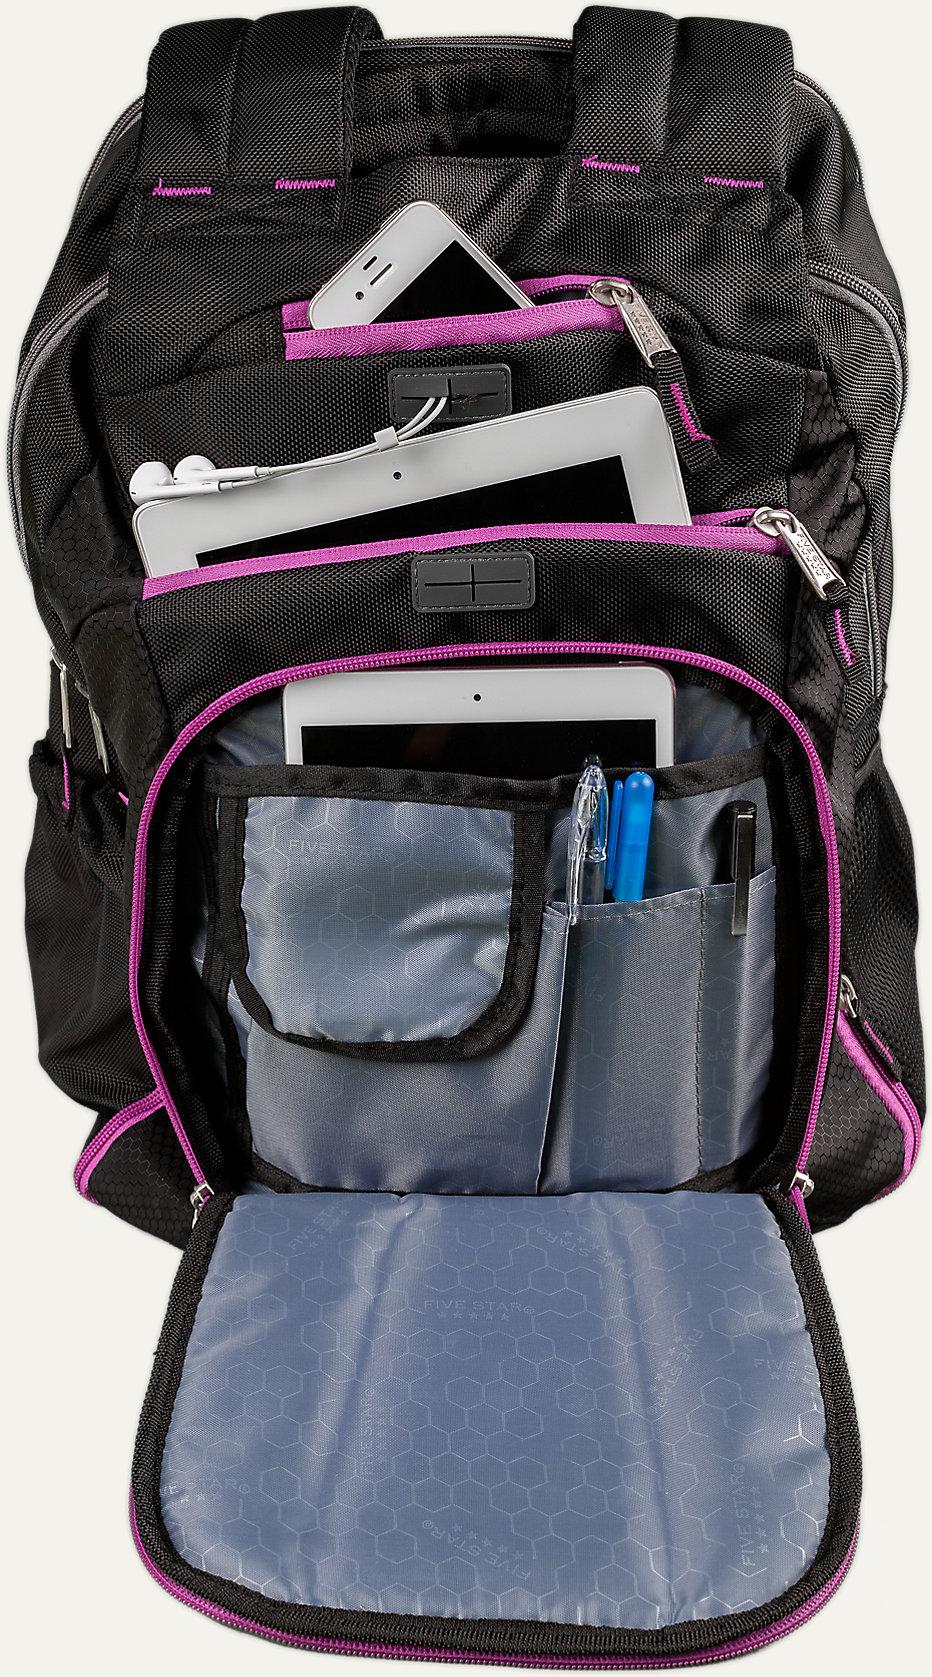 Ultimate Tech Backpack Bundle ( # BKPCKTECH)